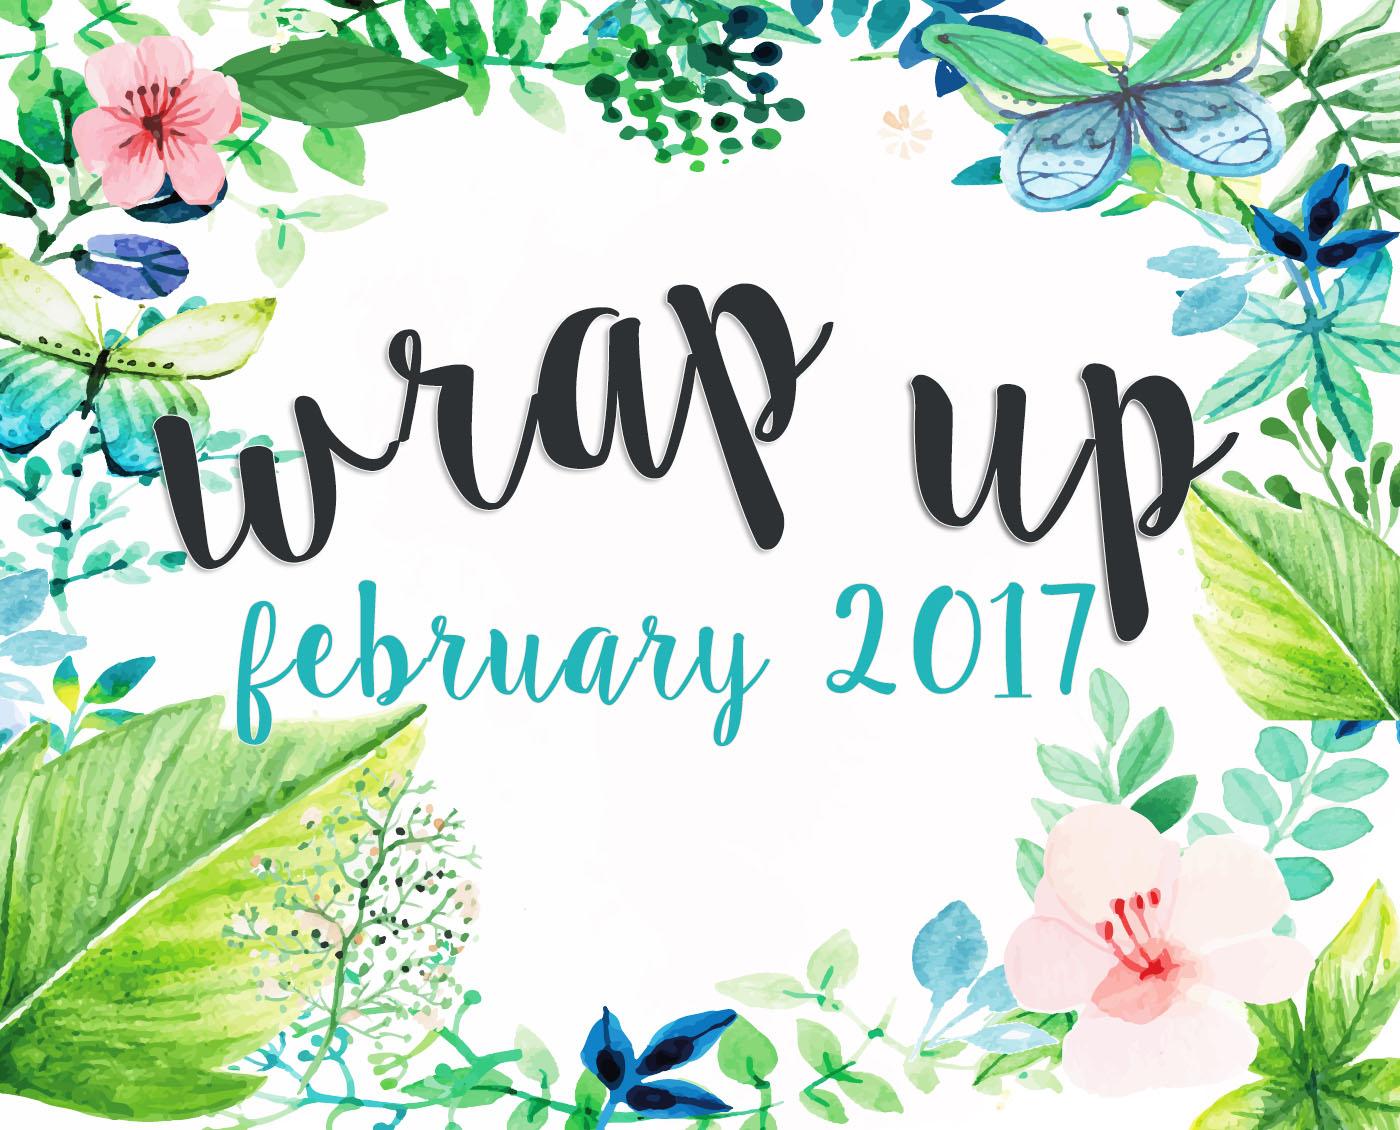 wrap up february 2017